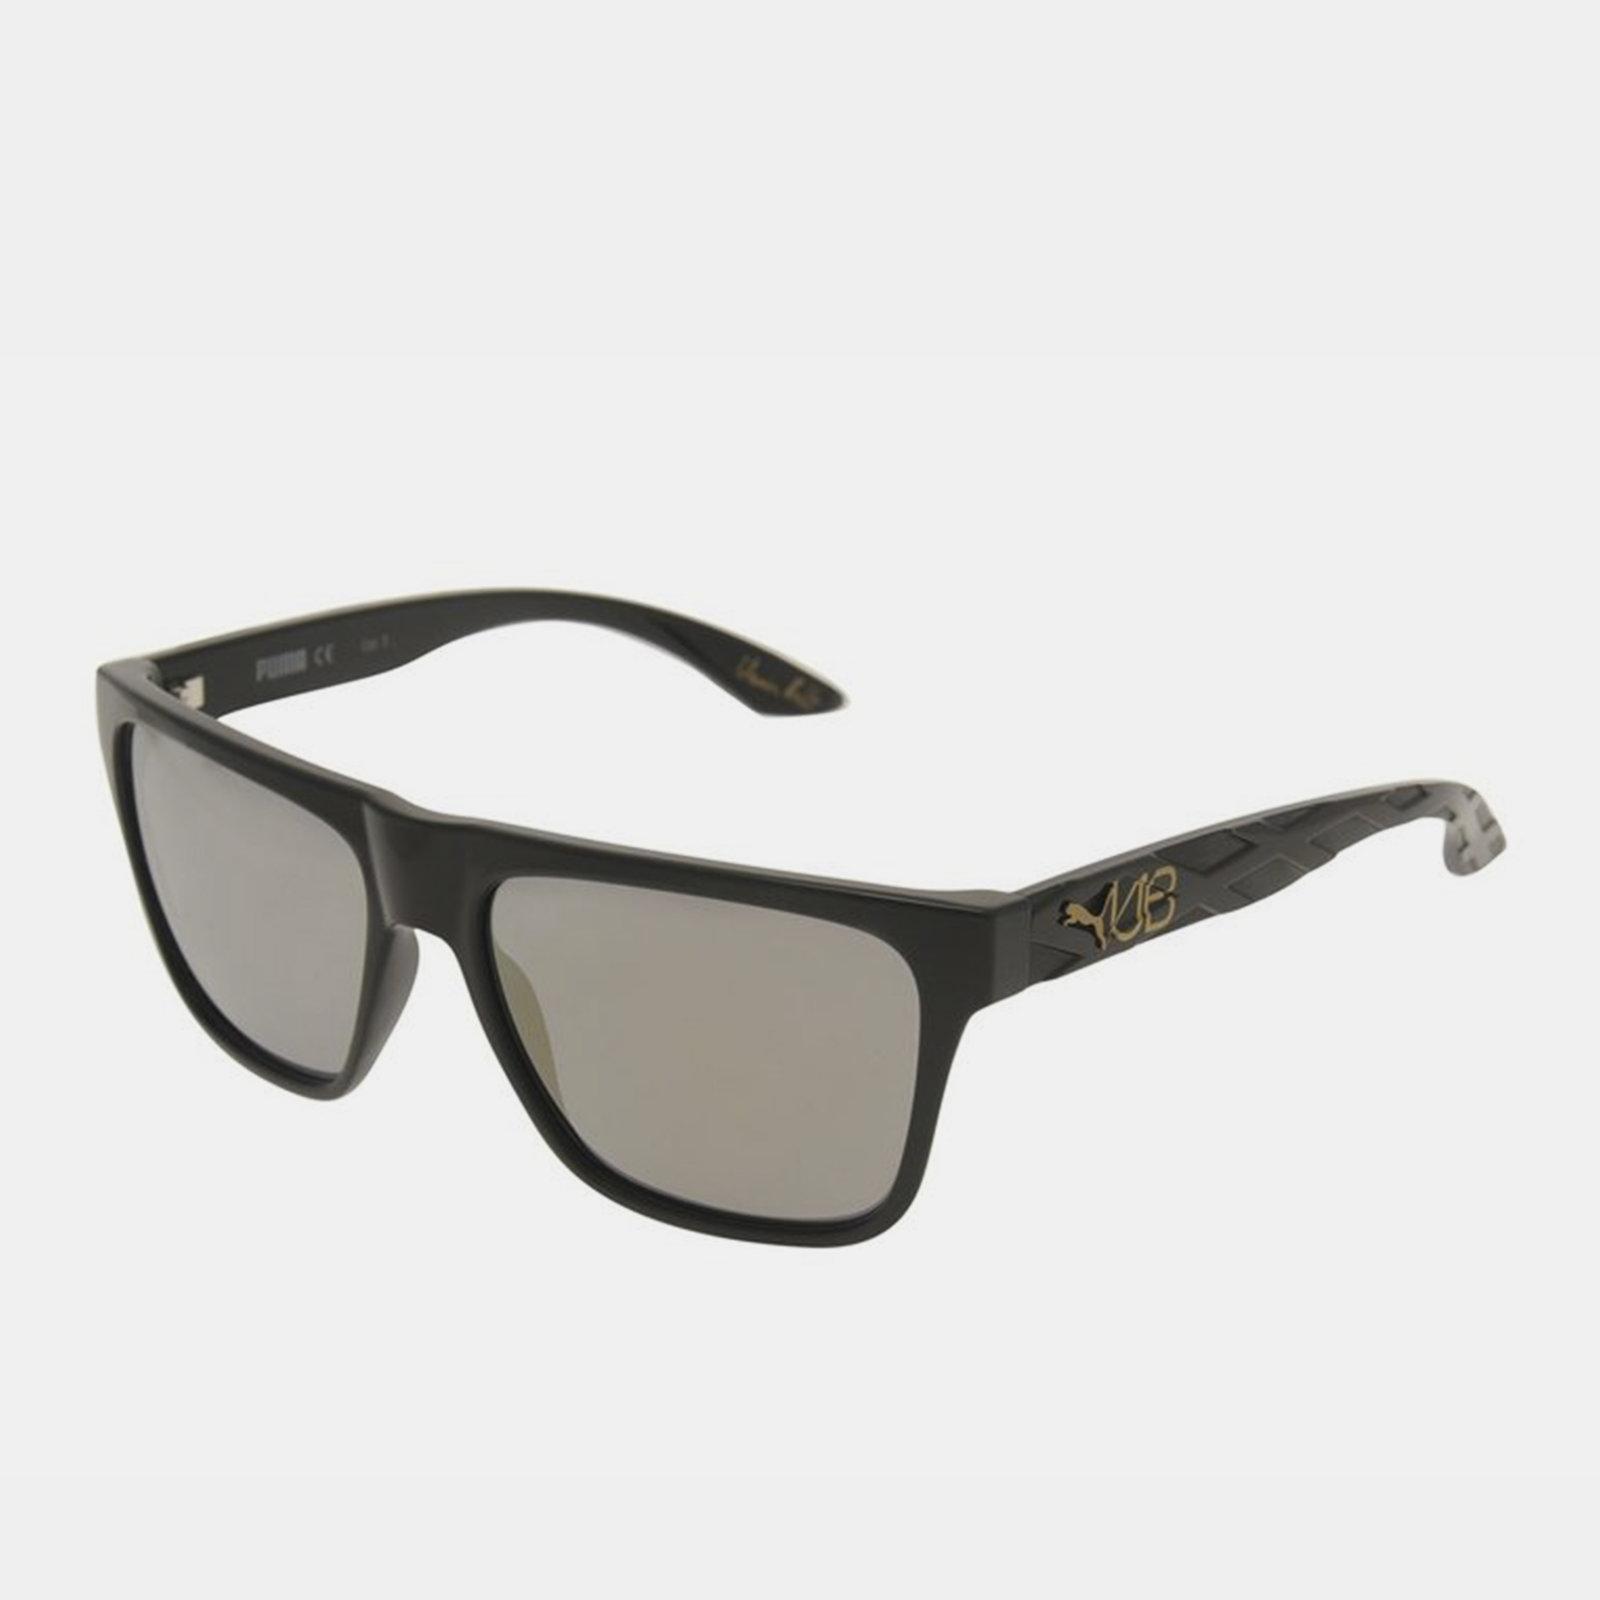 Usain Bolt Wayfarer Sunglasses